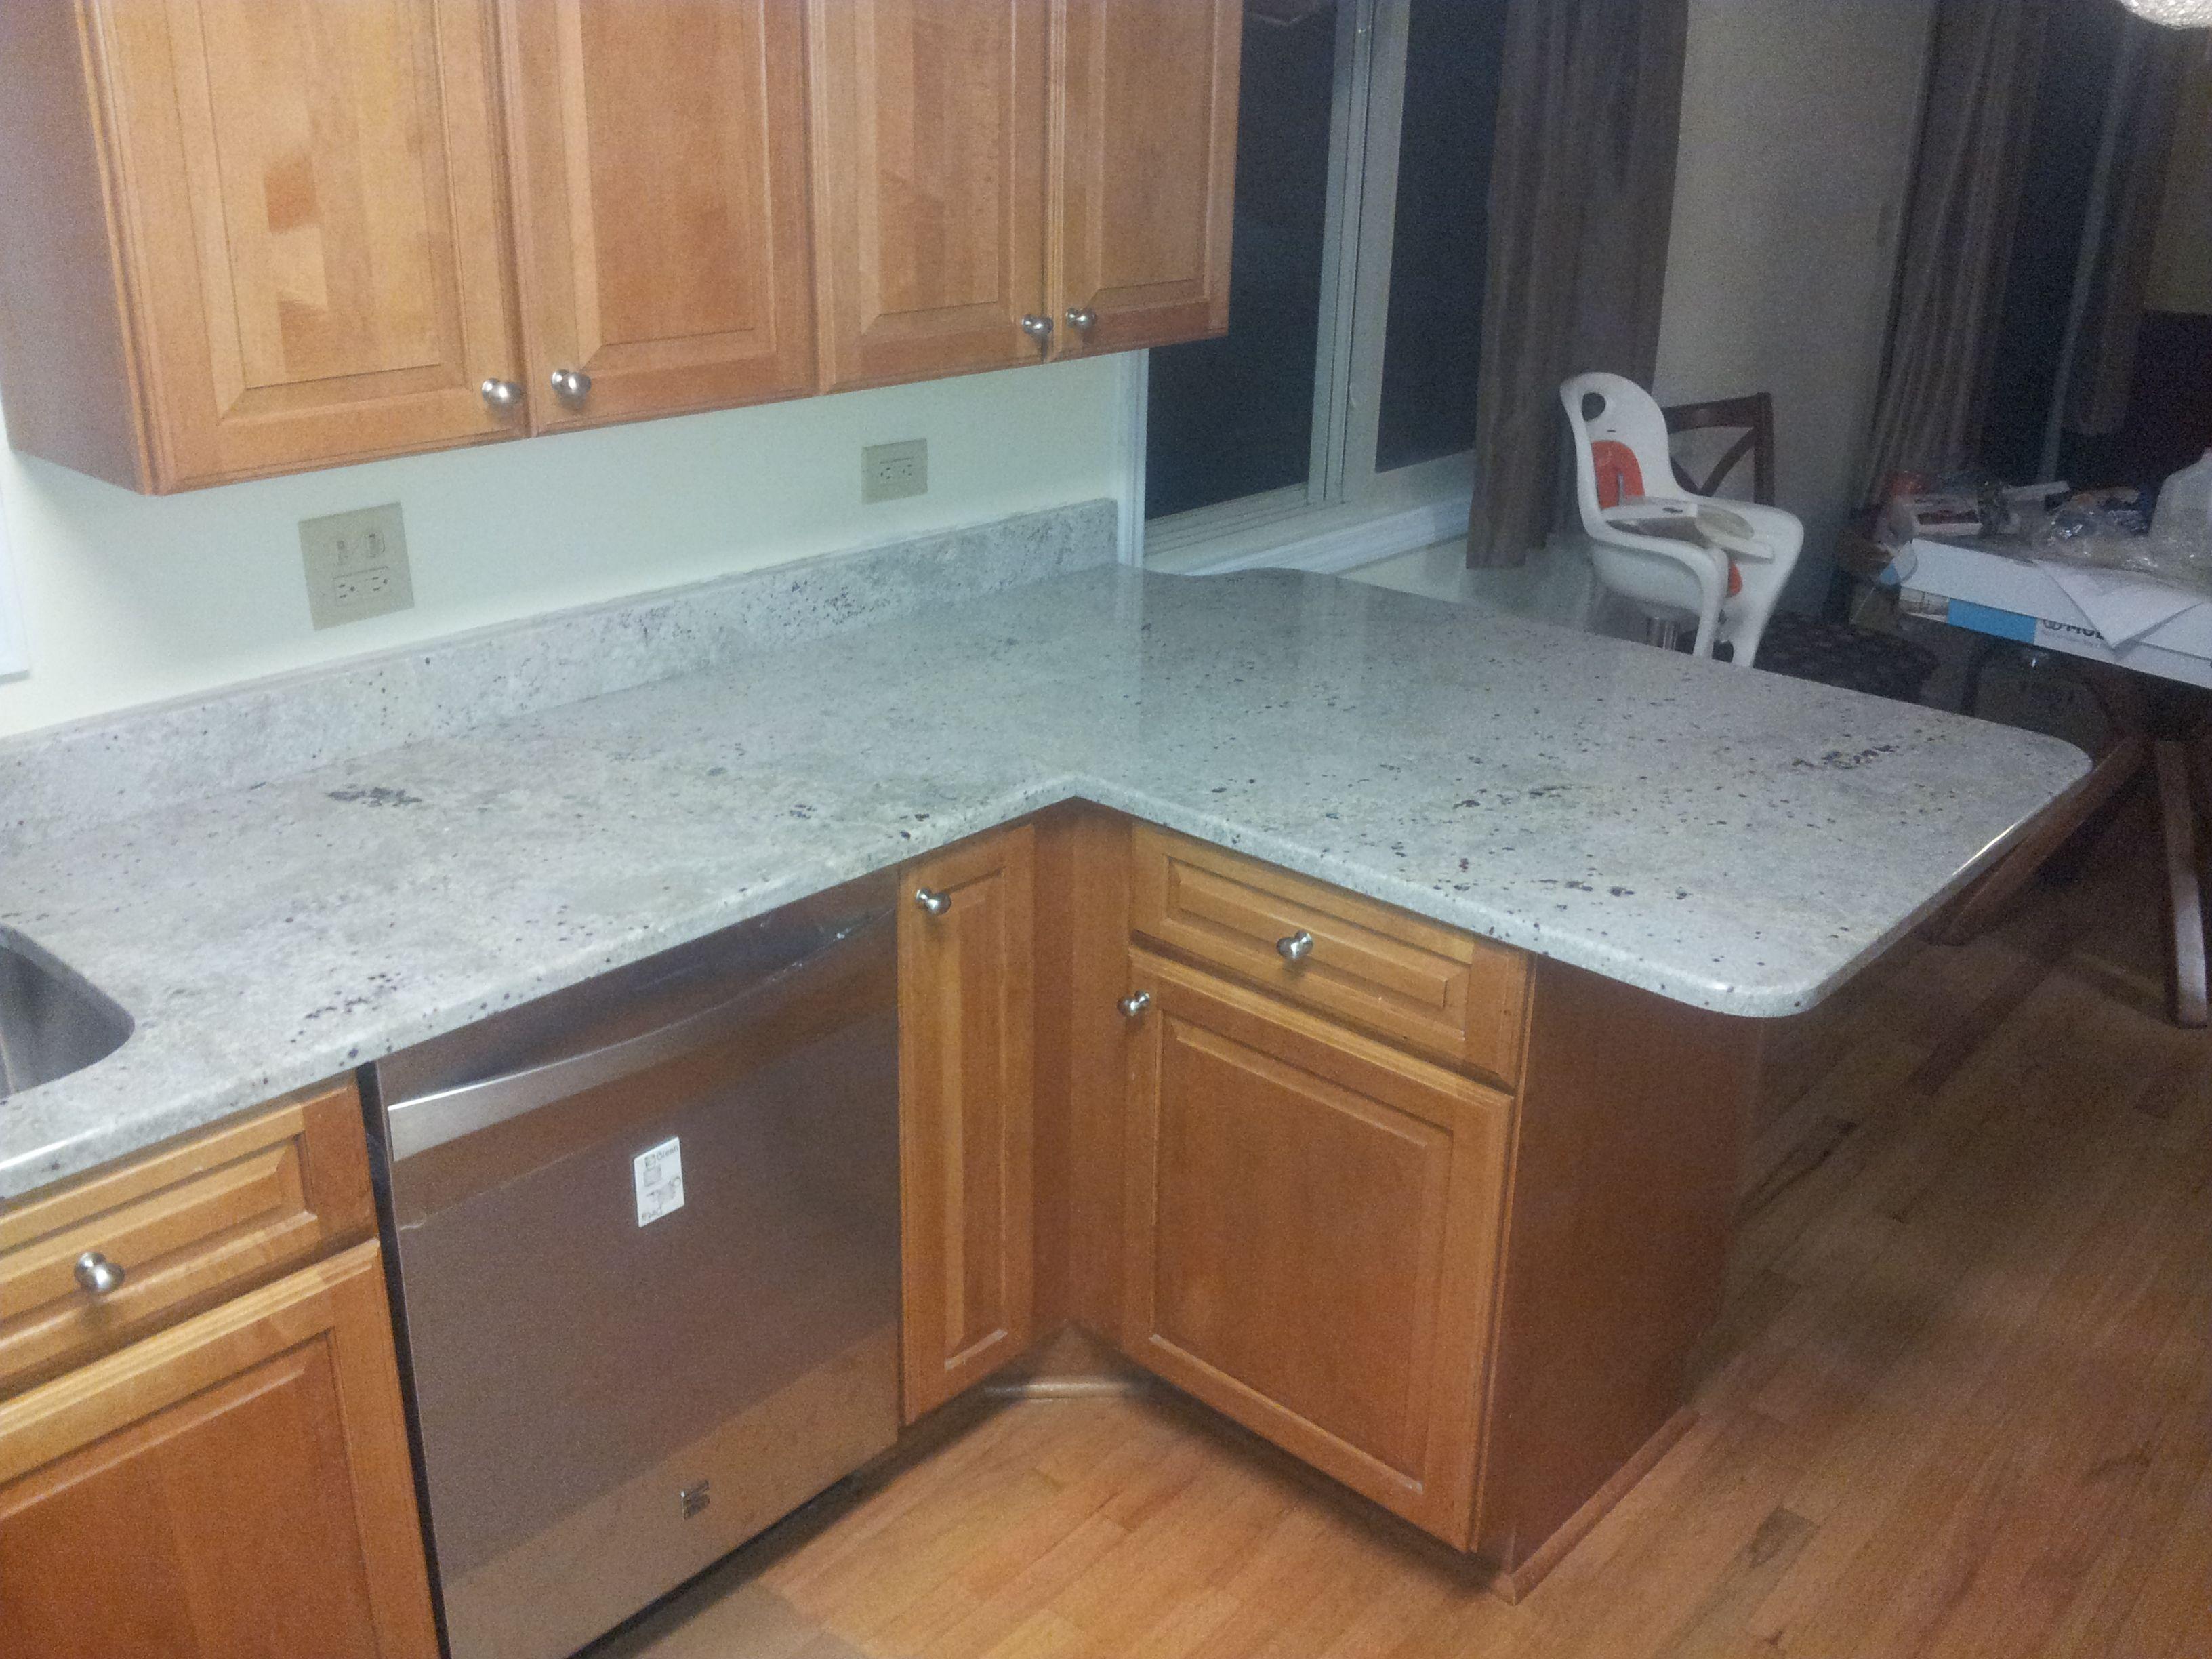 Art Granite Countertops Inc 1020 Lunt Ave Unit F Schaumburg Il 60193 Tel 847 923 1323 Granite Countertops Kitchen Kitchen Countertops Granite Kitchen